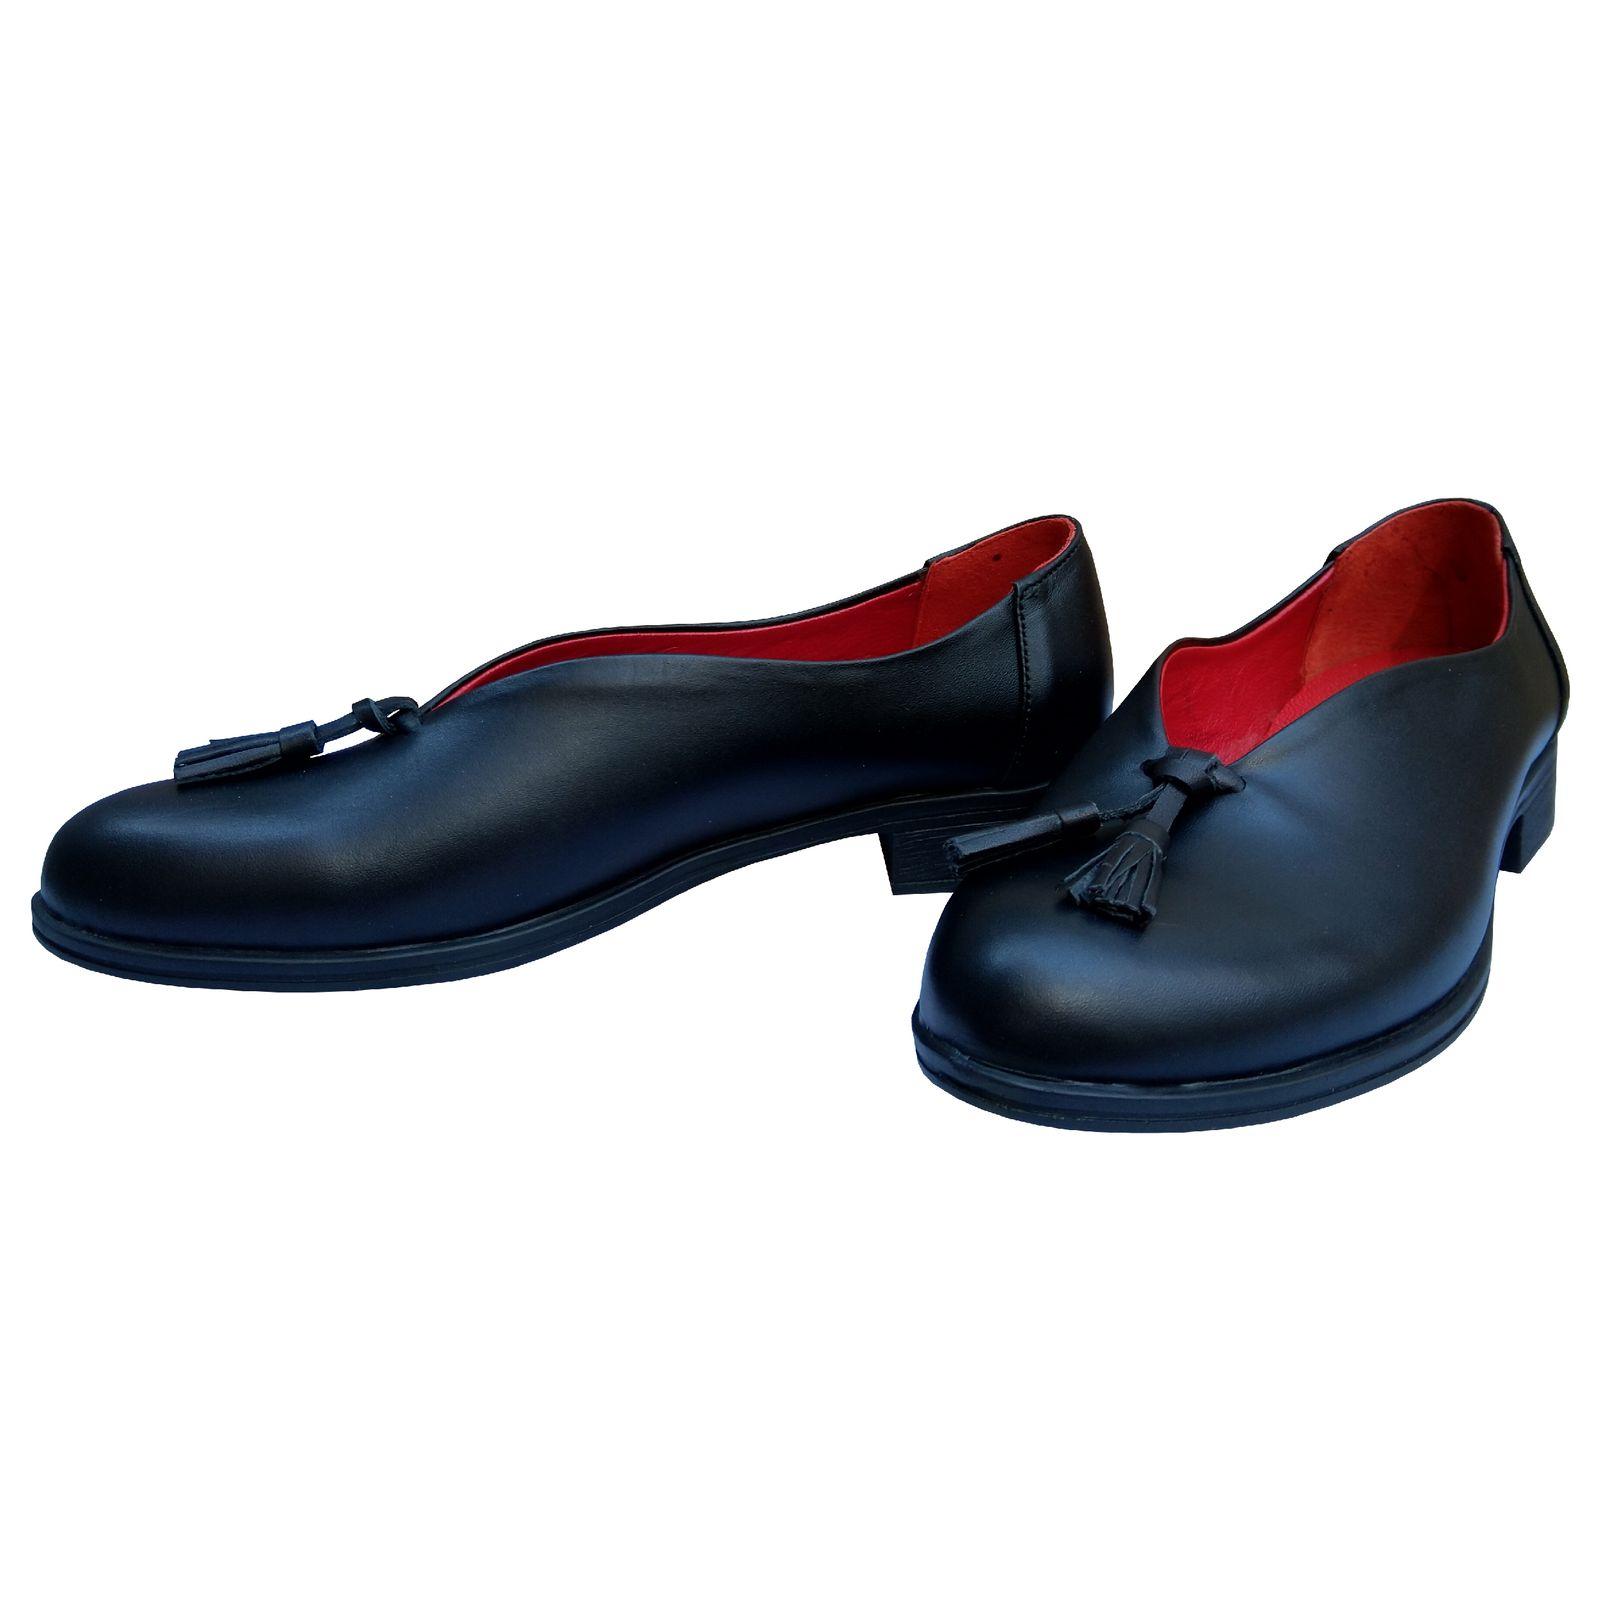 کفش زنانه مدل SK 309 -  - 4